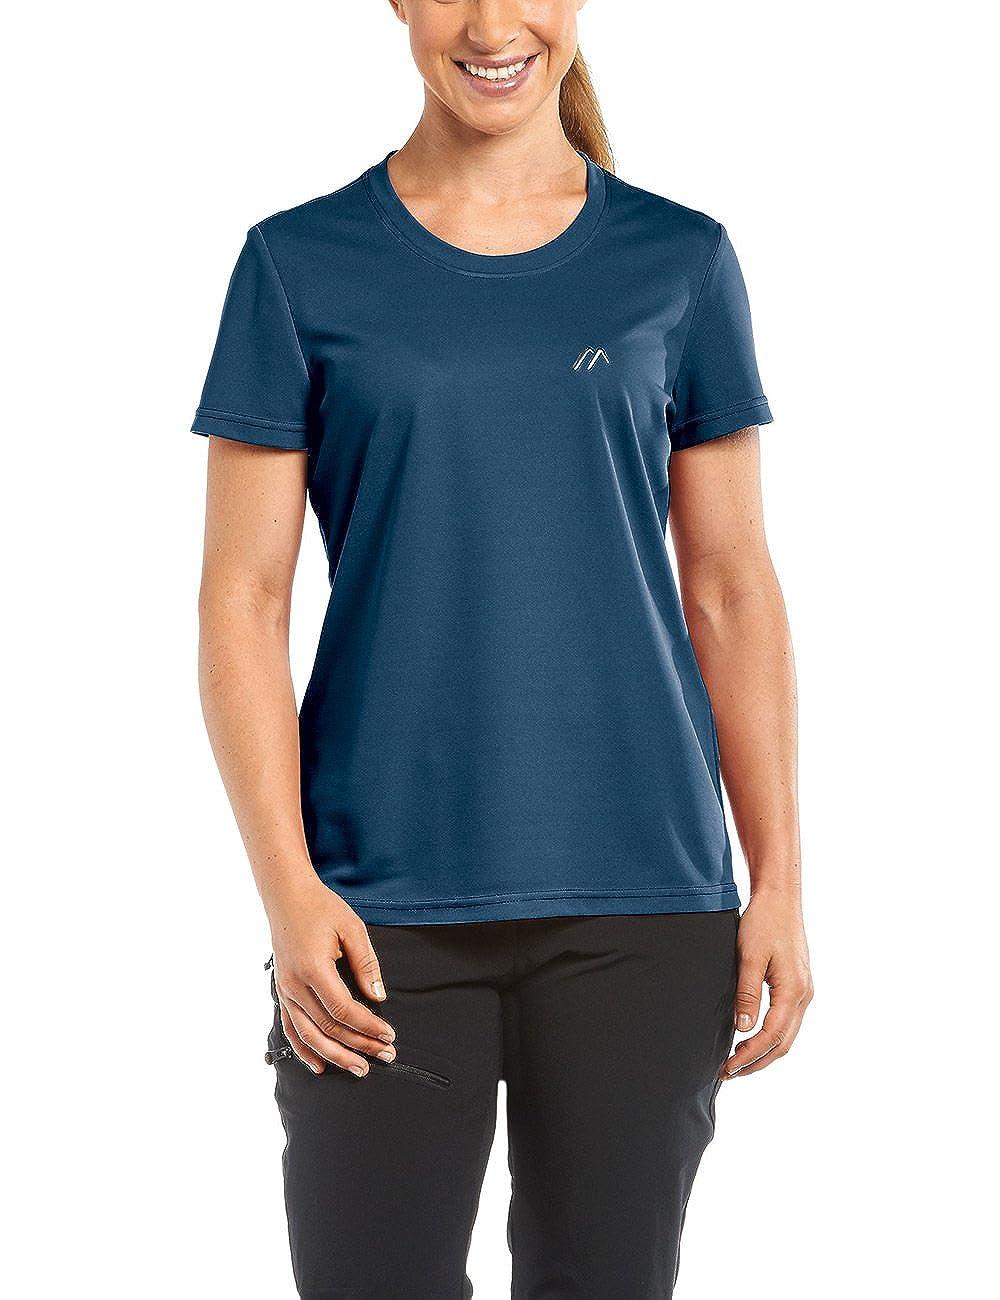 TALLA 40. maier sports Piquee Program - Camiseta para Mujer